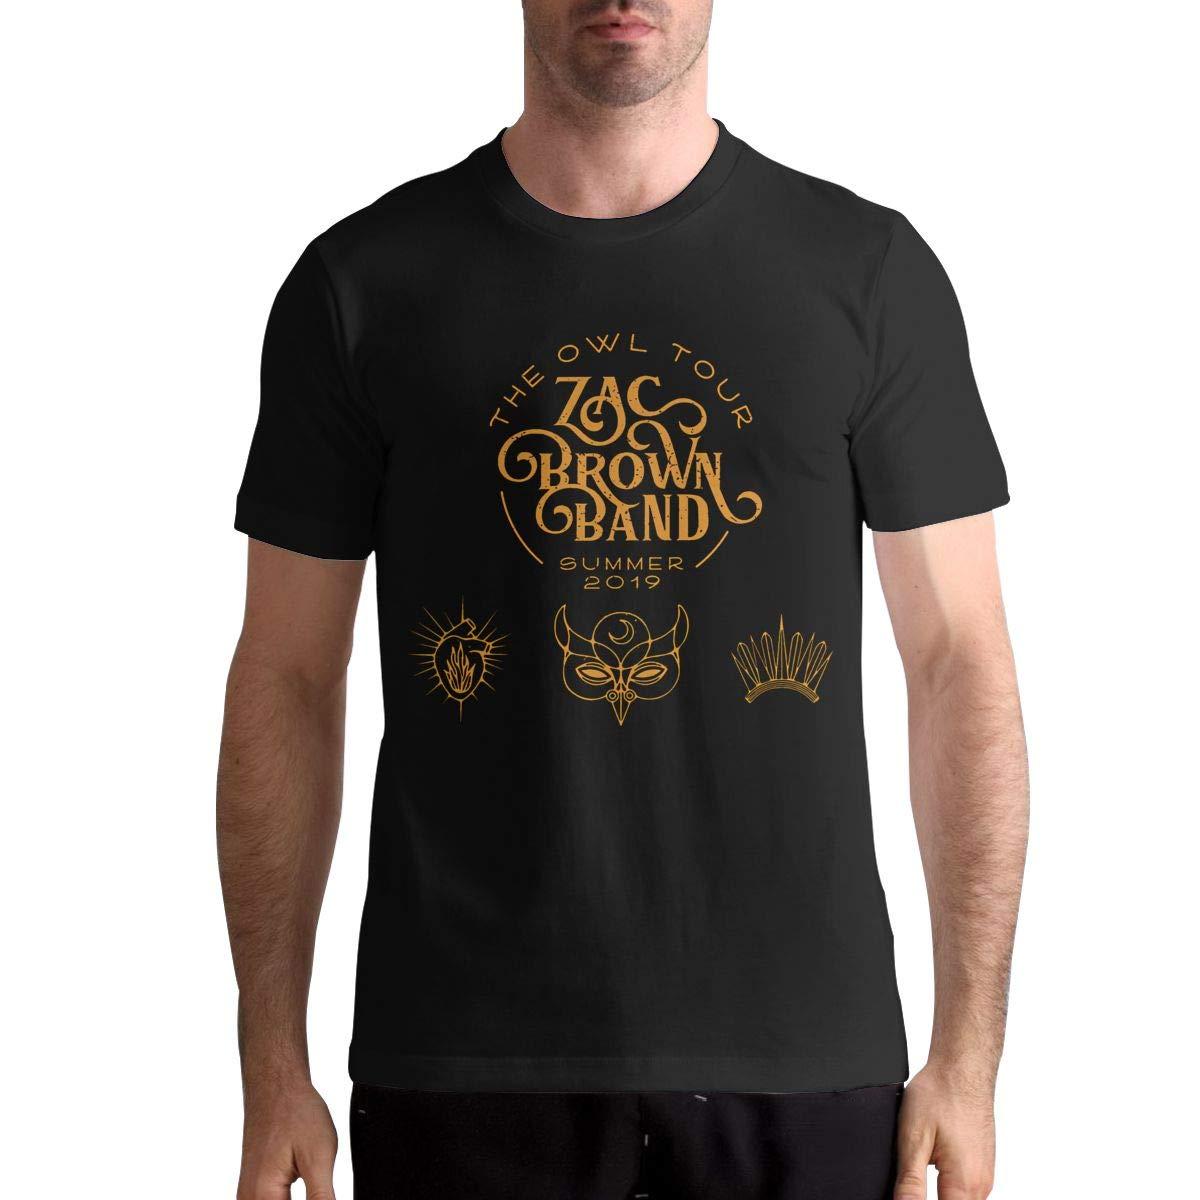 David E Everett Zac Brown Band Mens T Shirt Cotton Fashion Sports Casual Round Neck Short Sleeve Tees